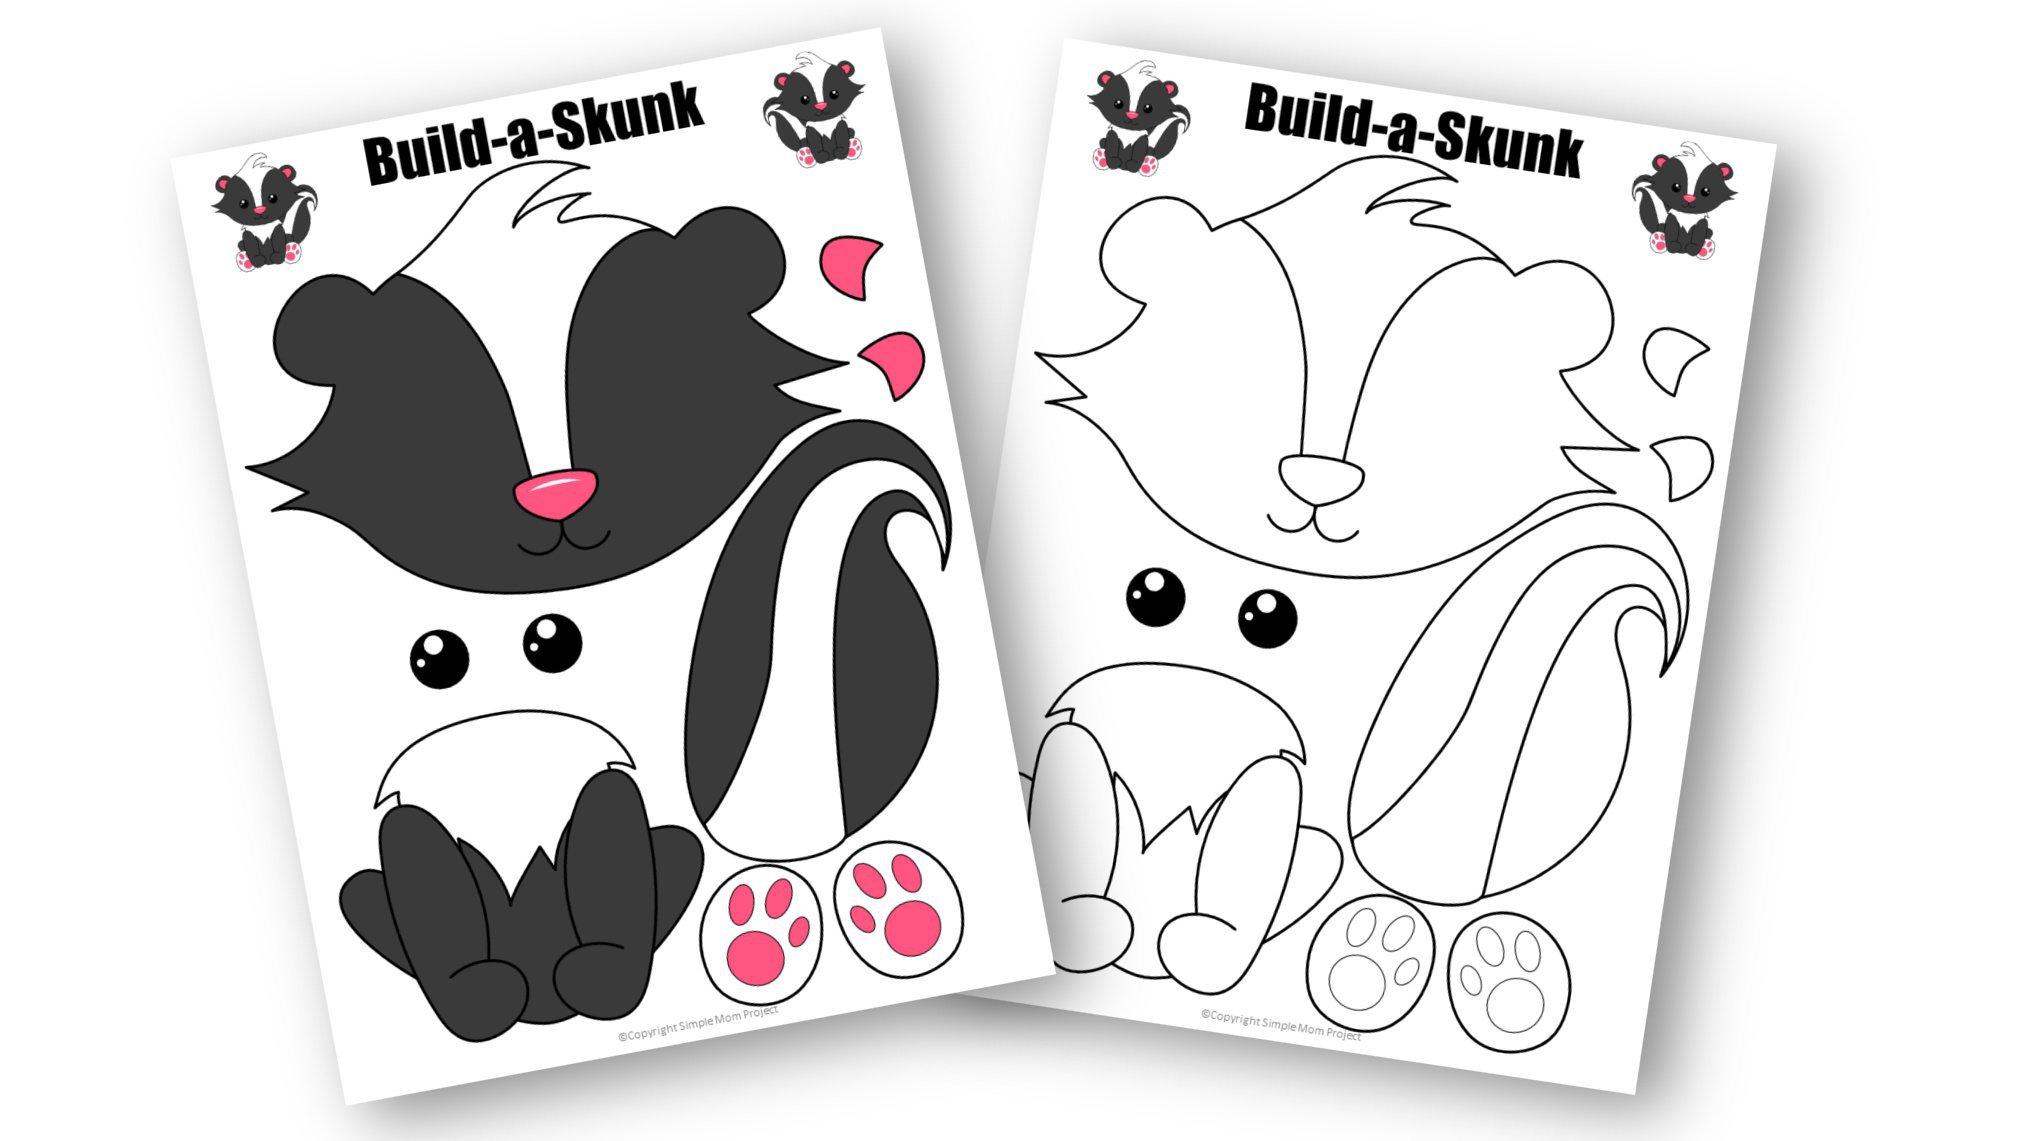 Free Printable Forest Skunk Craft Template for kids, preschoolers, toddlers and kindergartners